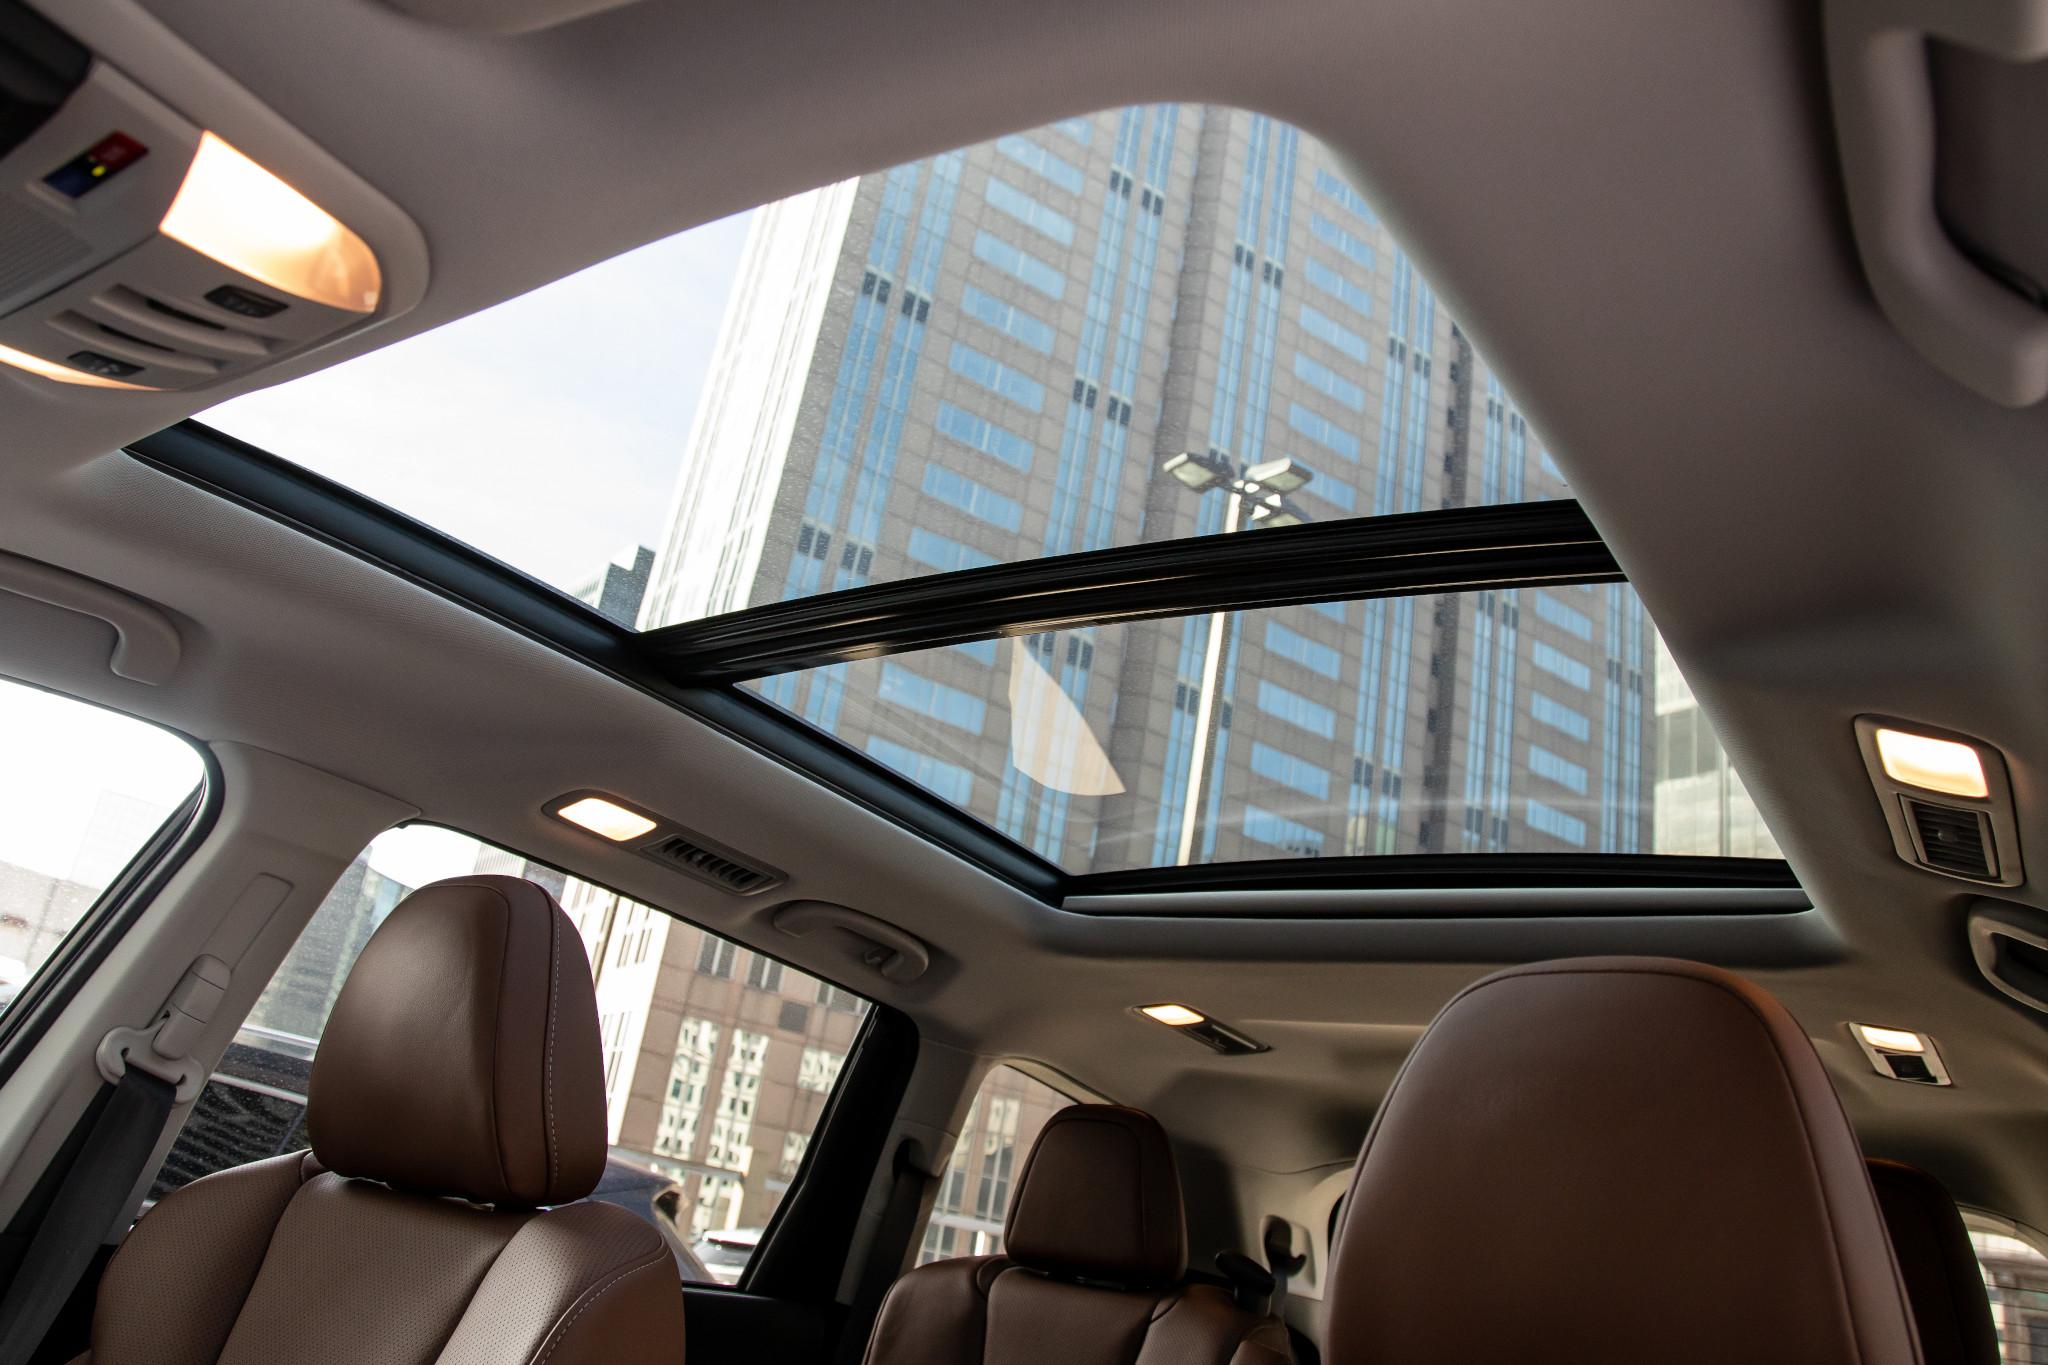 subaru-ascent-touring-awd-2020-32-interior--sunroof.jpg